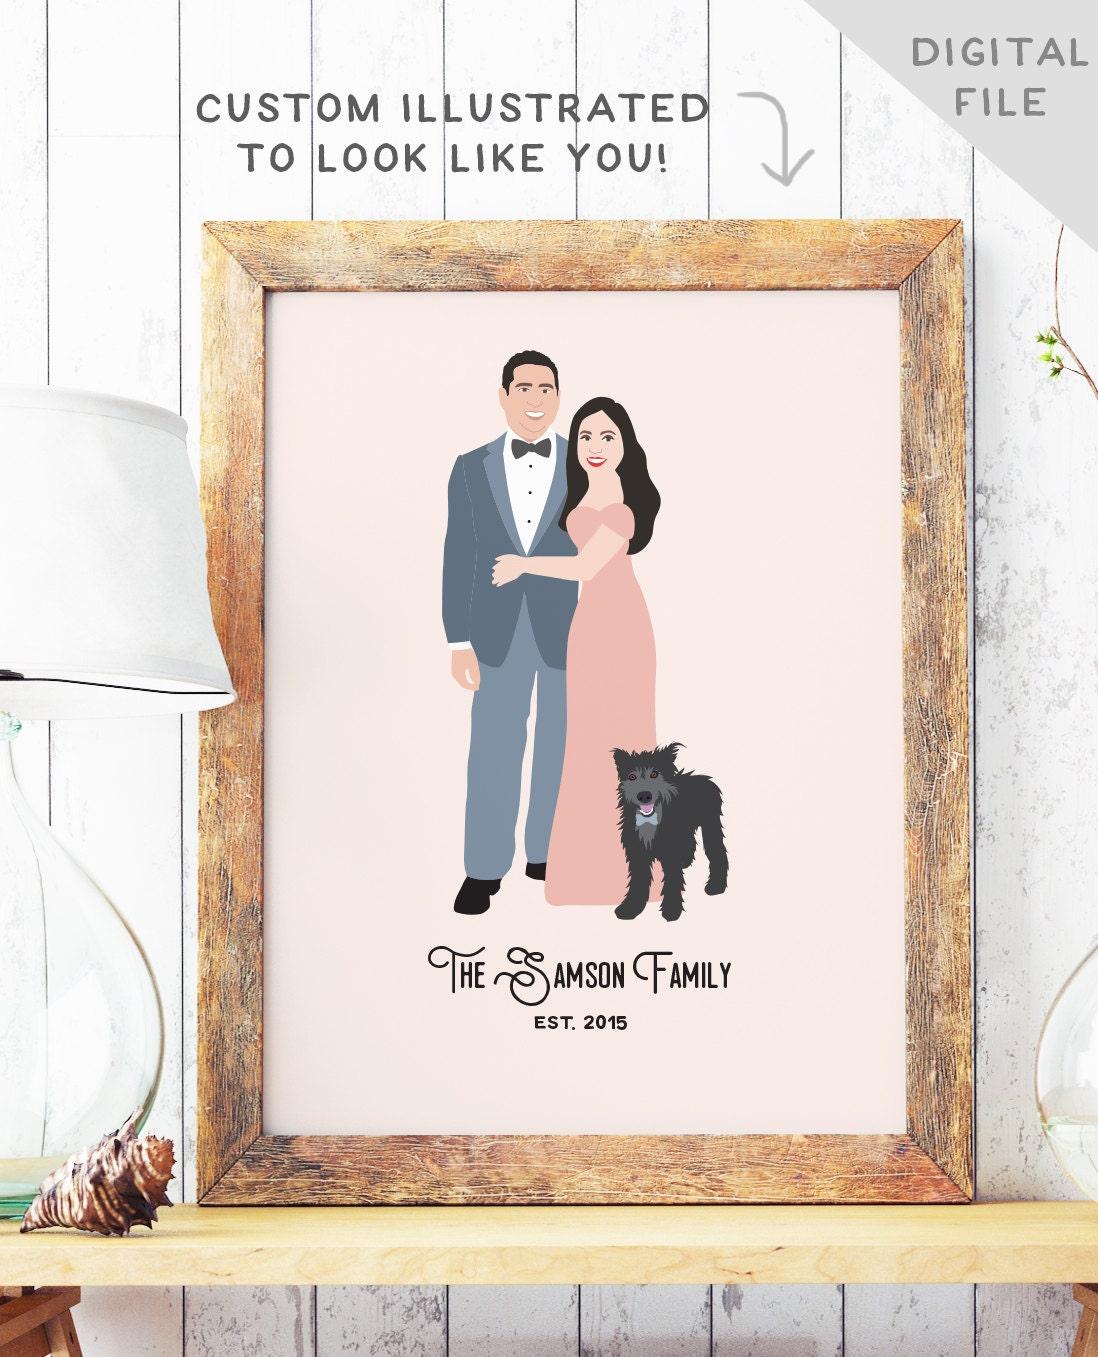 St anniversary gift th couple portait